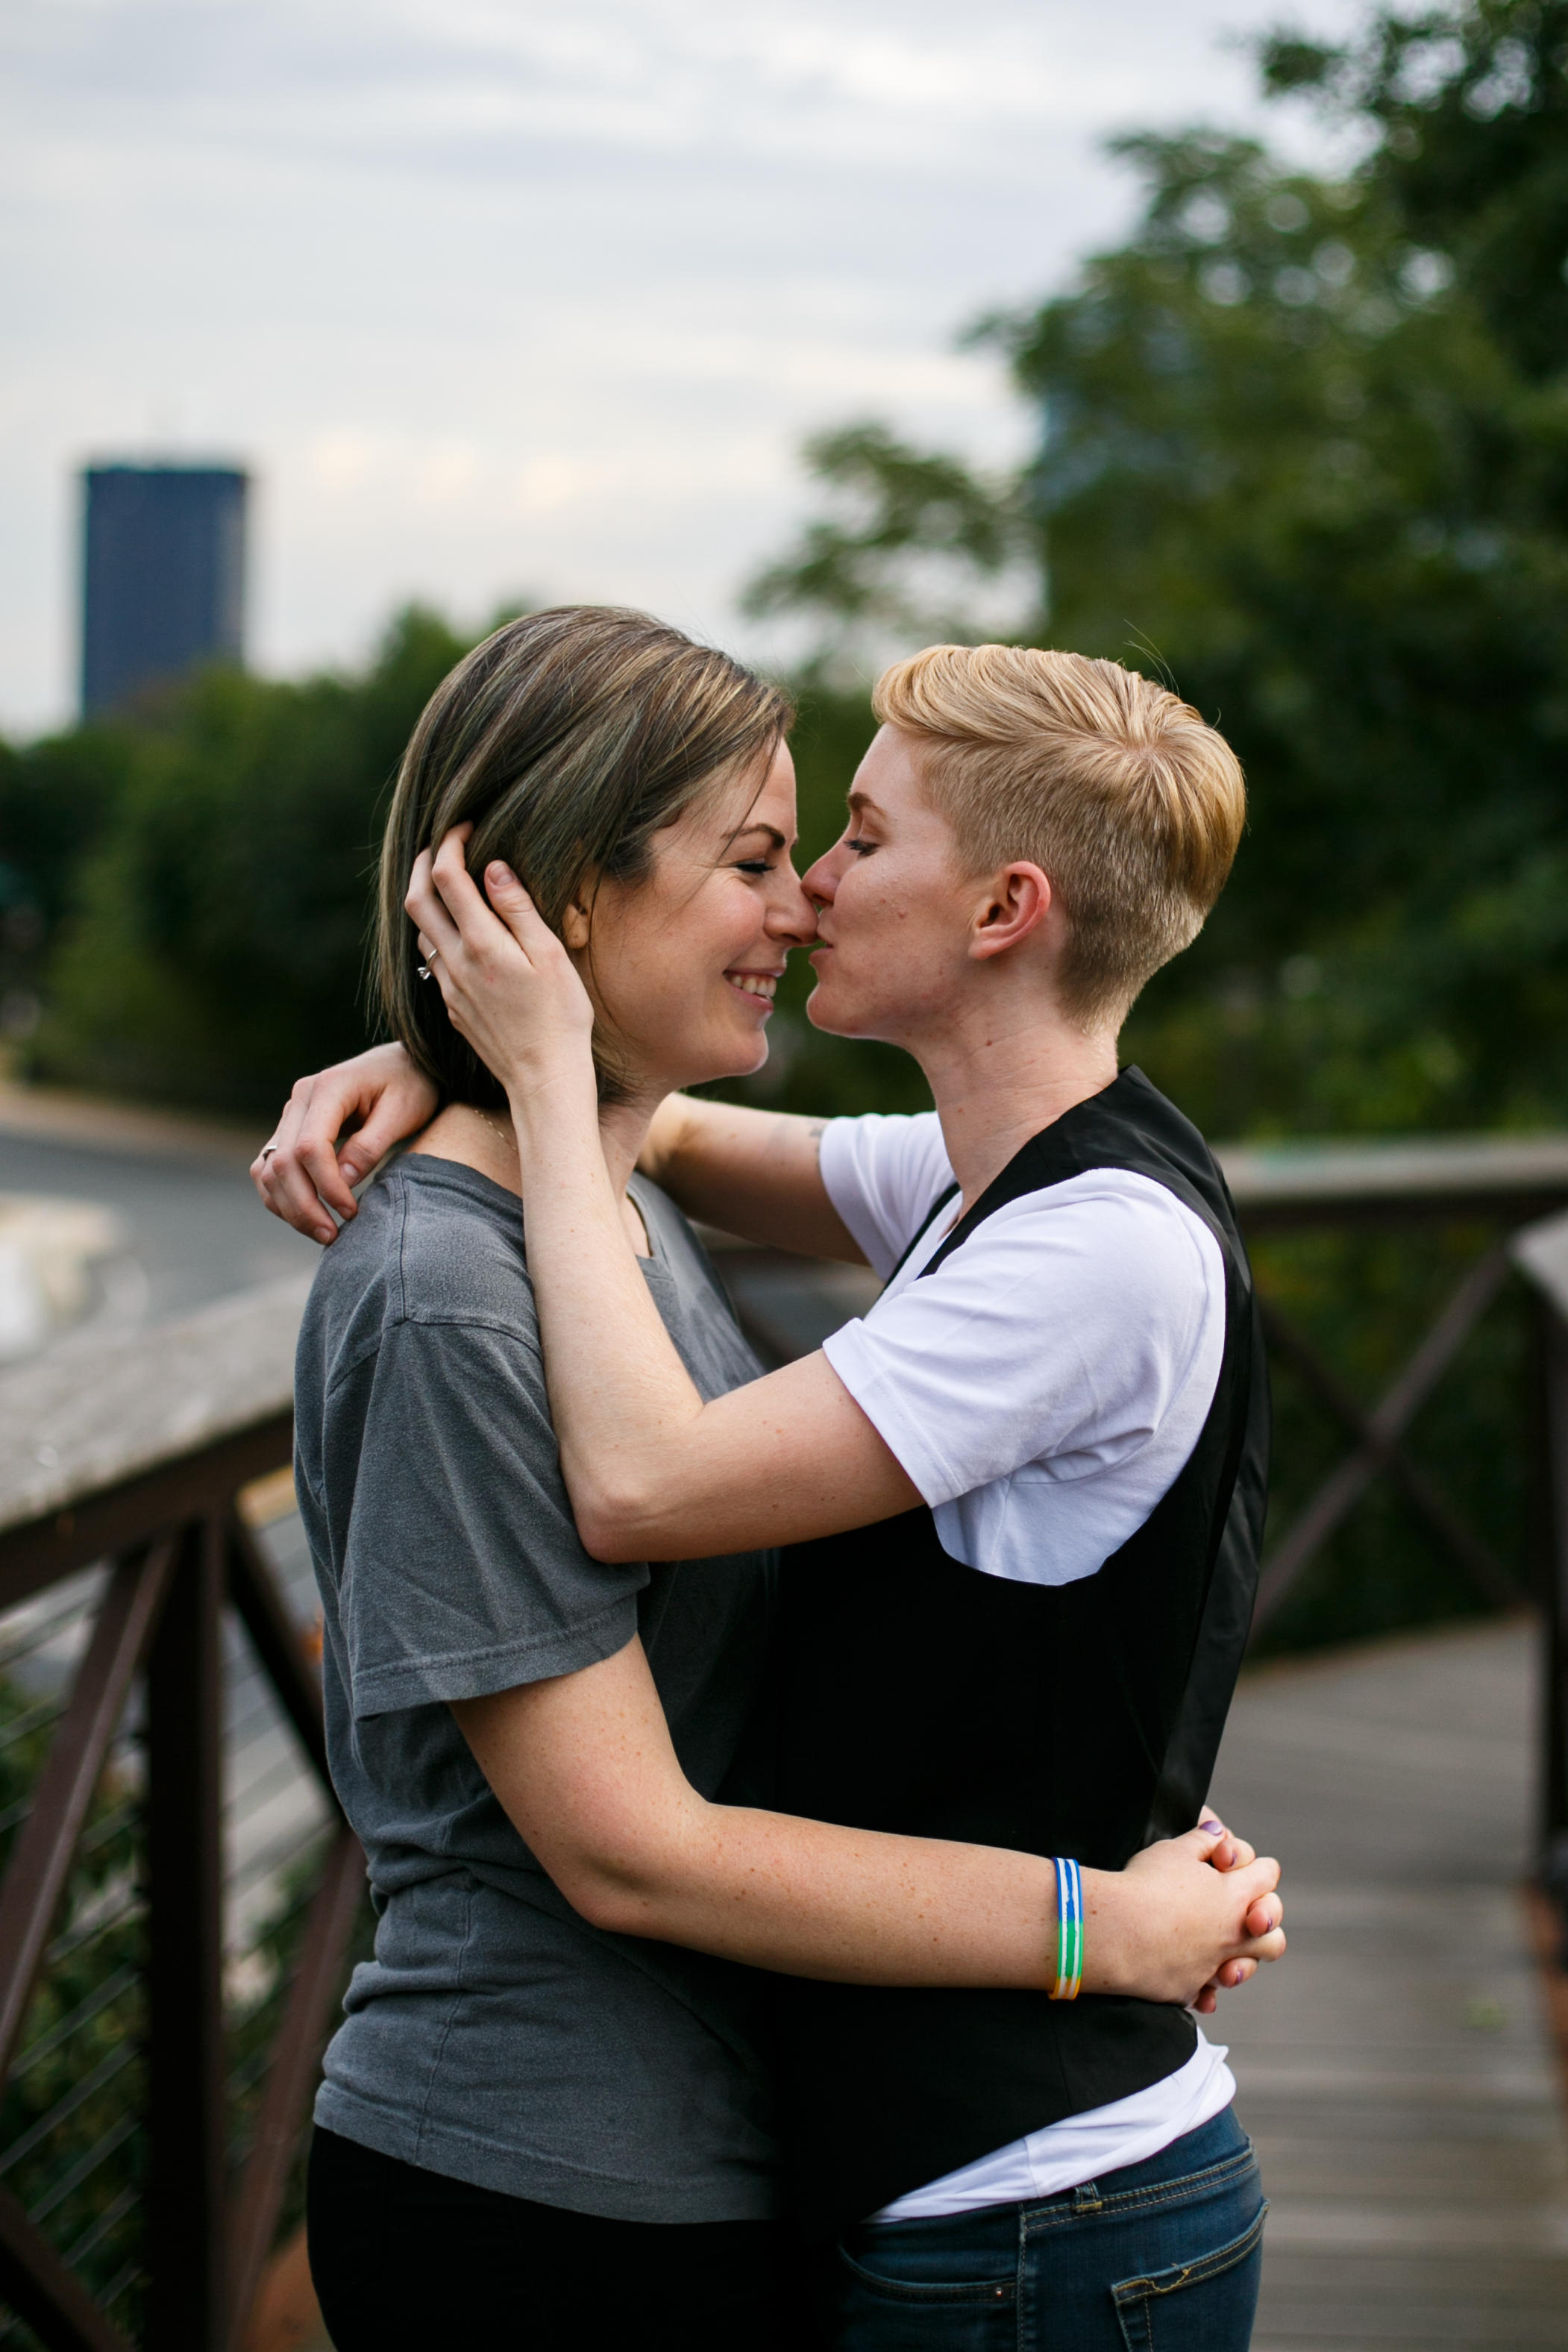 Philadelphia Queer Engagement Session by Lesbian Photographer Amanda Swiger 21